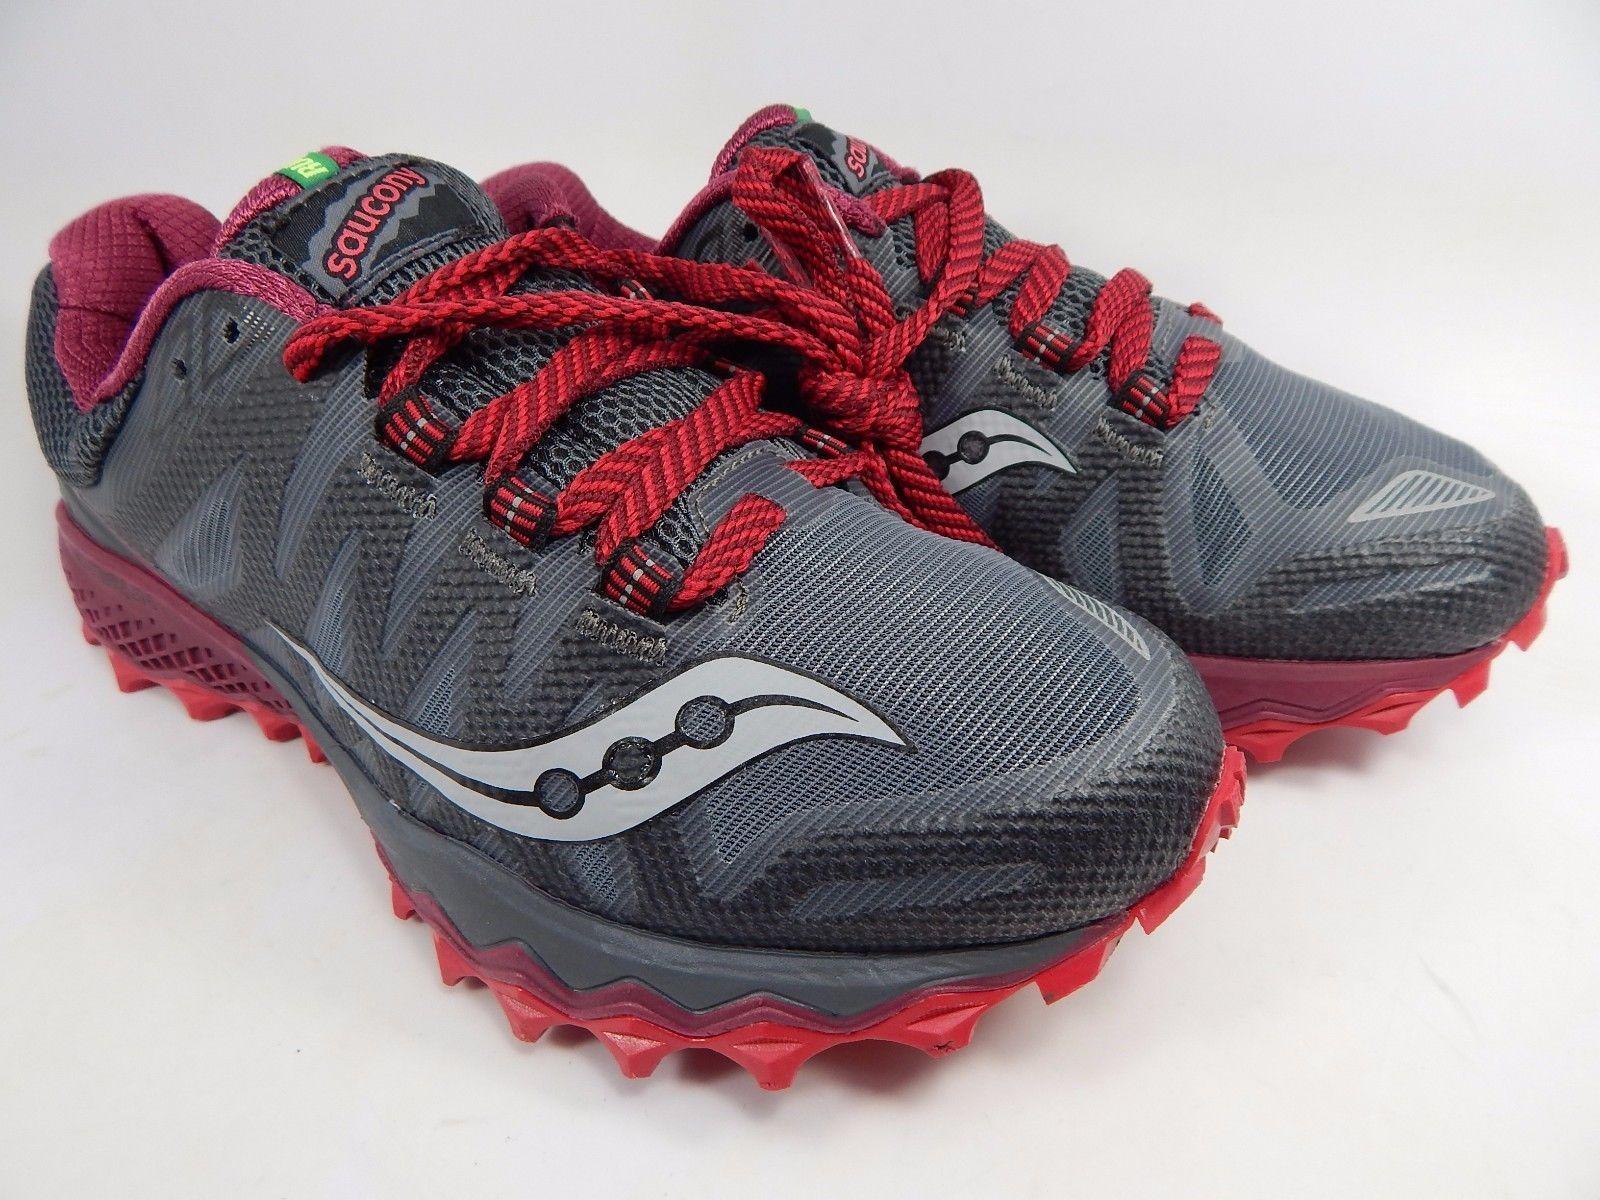 Saucony Peregrine 7 Women's Trail Running Shoes Size US 8.5 M (B) EU 40 S10359-1